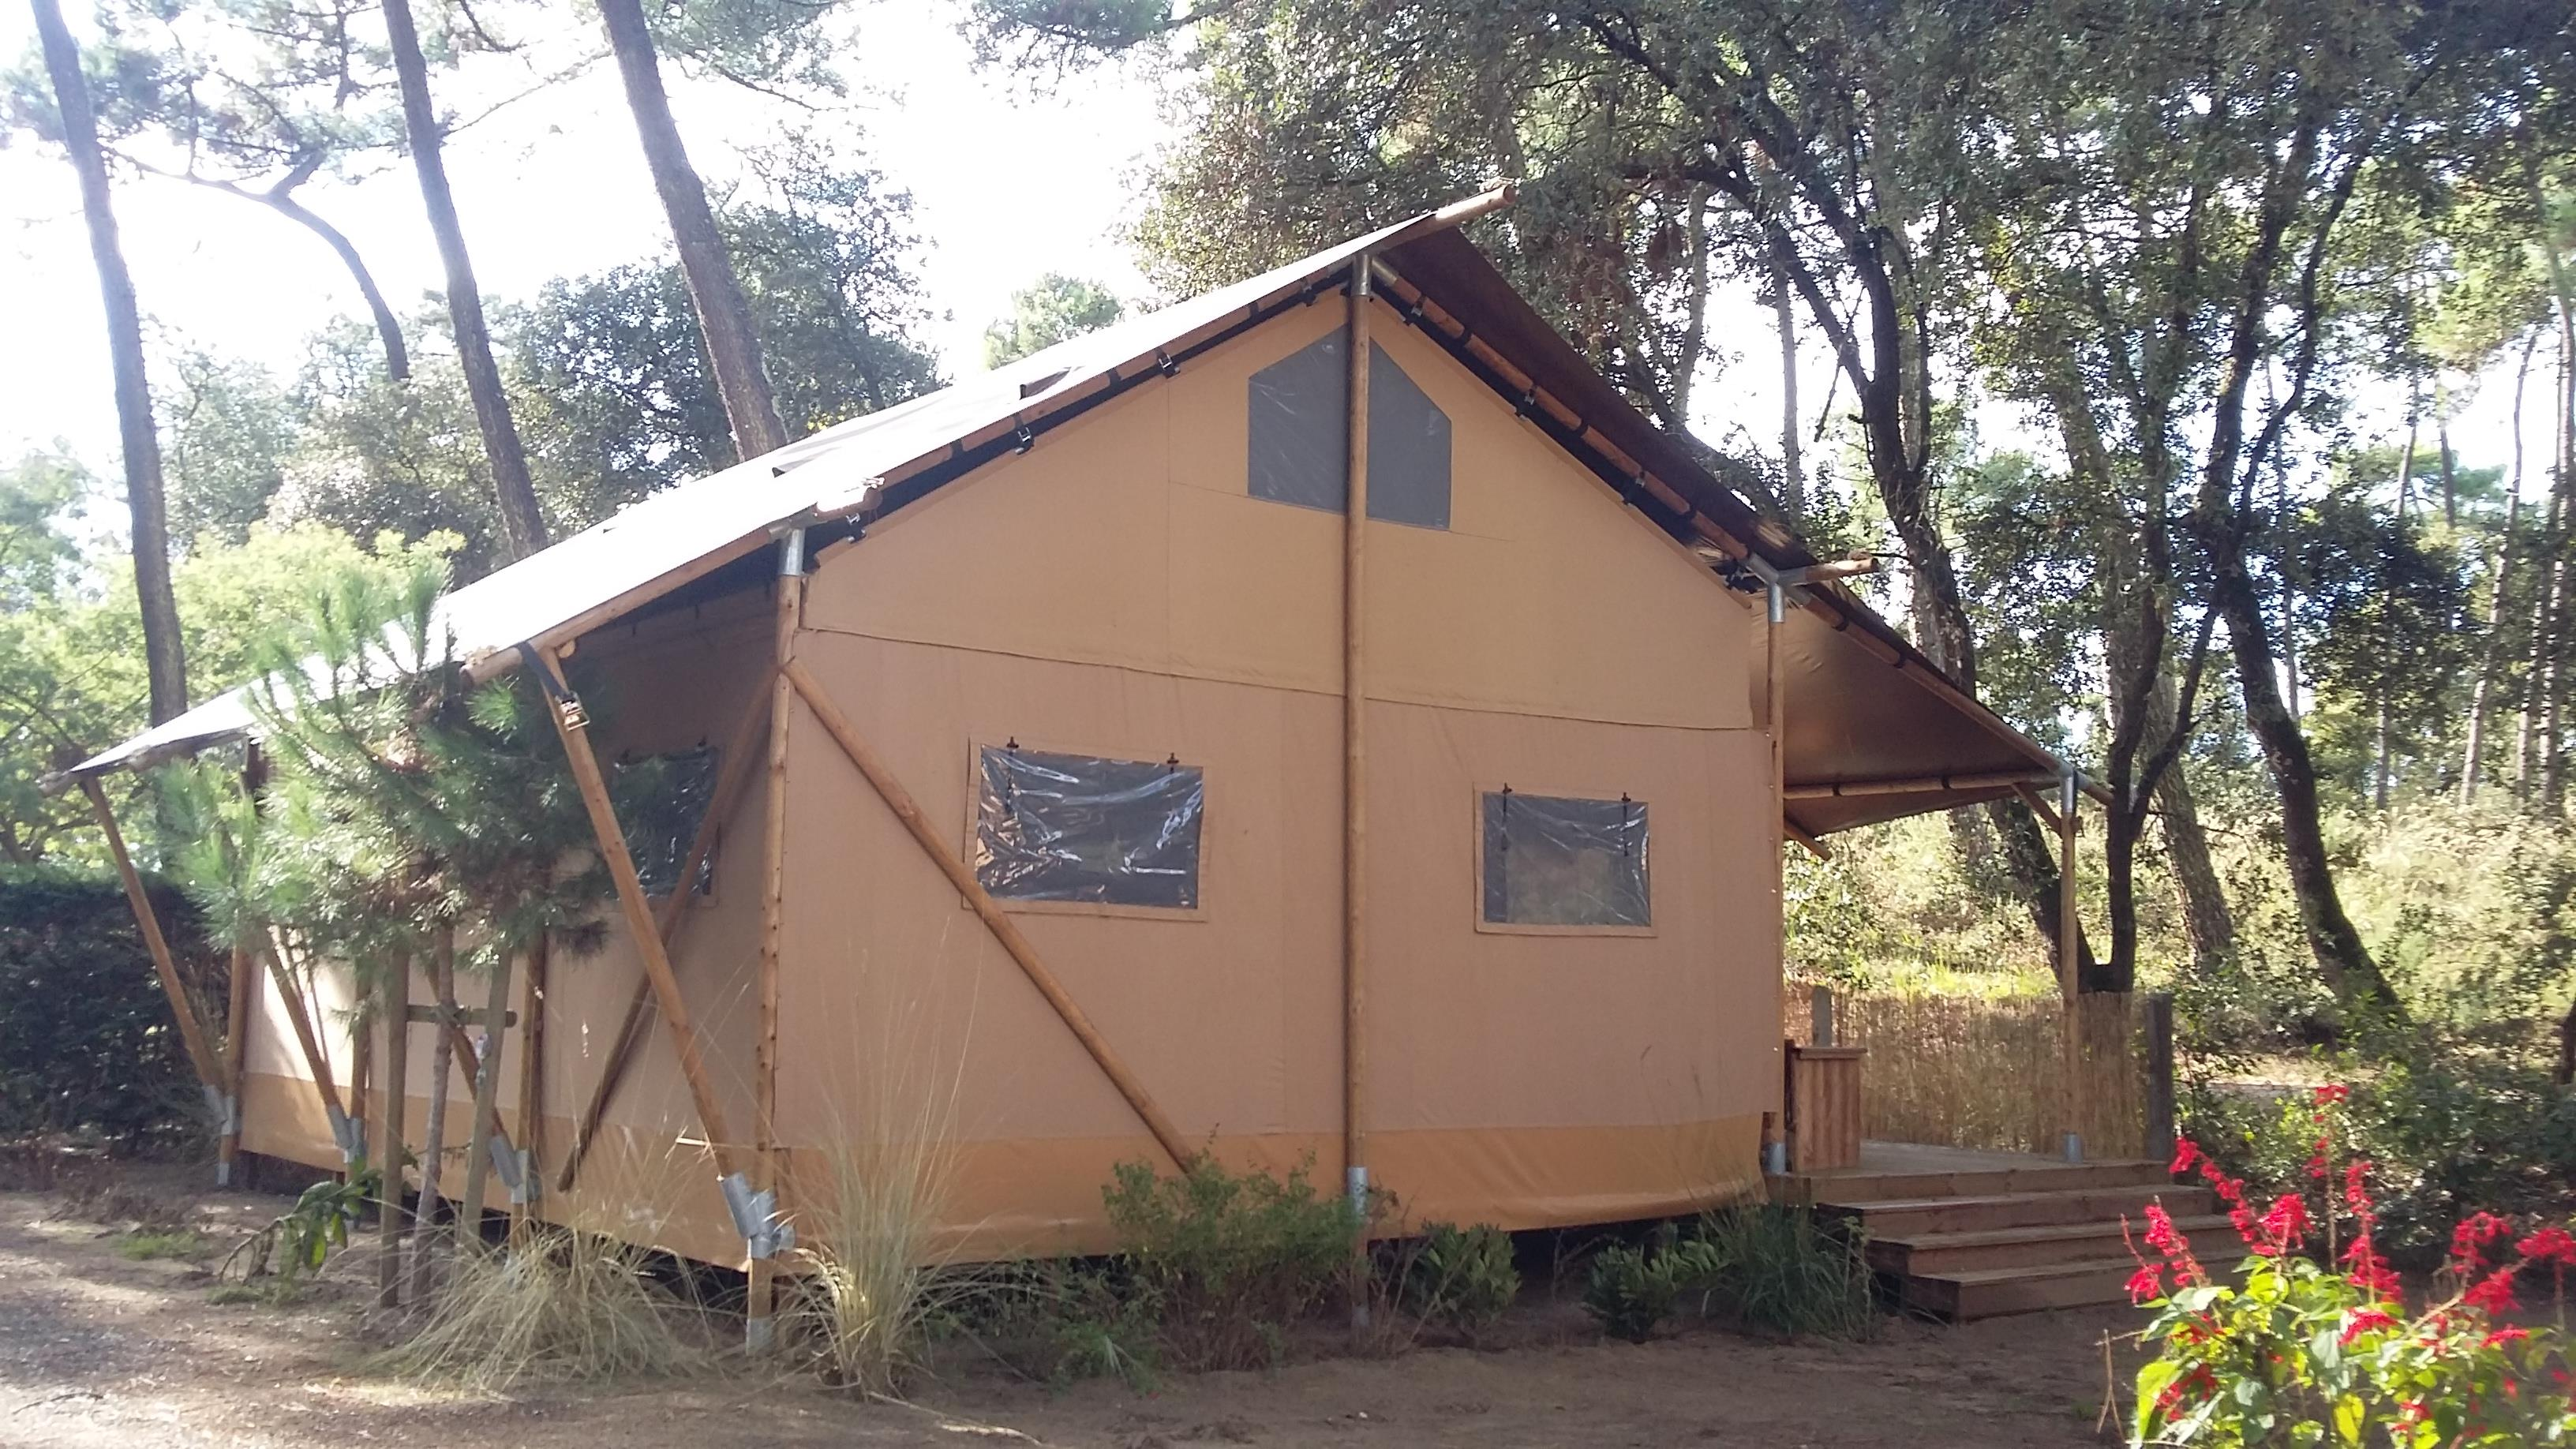 Location - Safari Lodge 8 / 2016 / 2 Chambres Parentales / Mezzanine - Camping-Club Les Pins